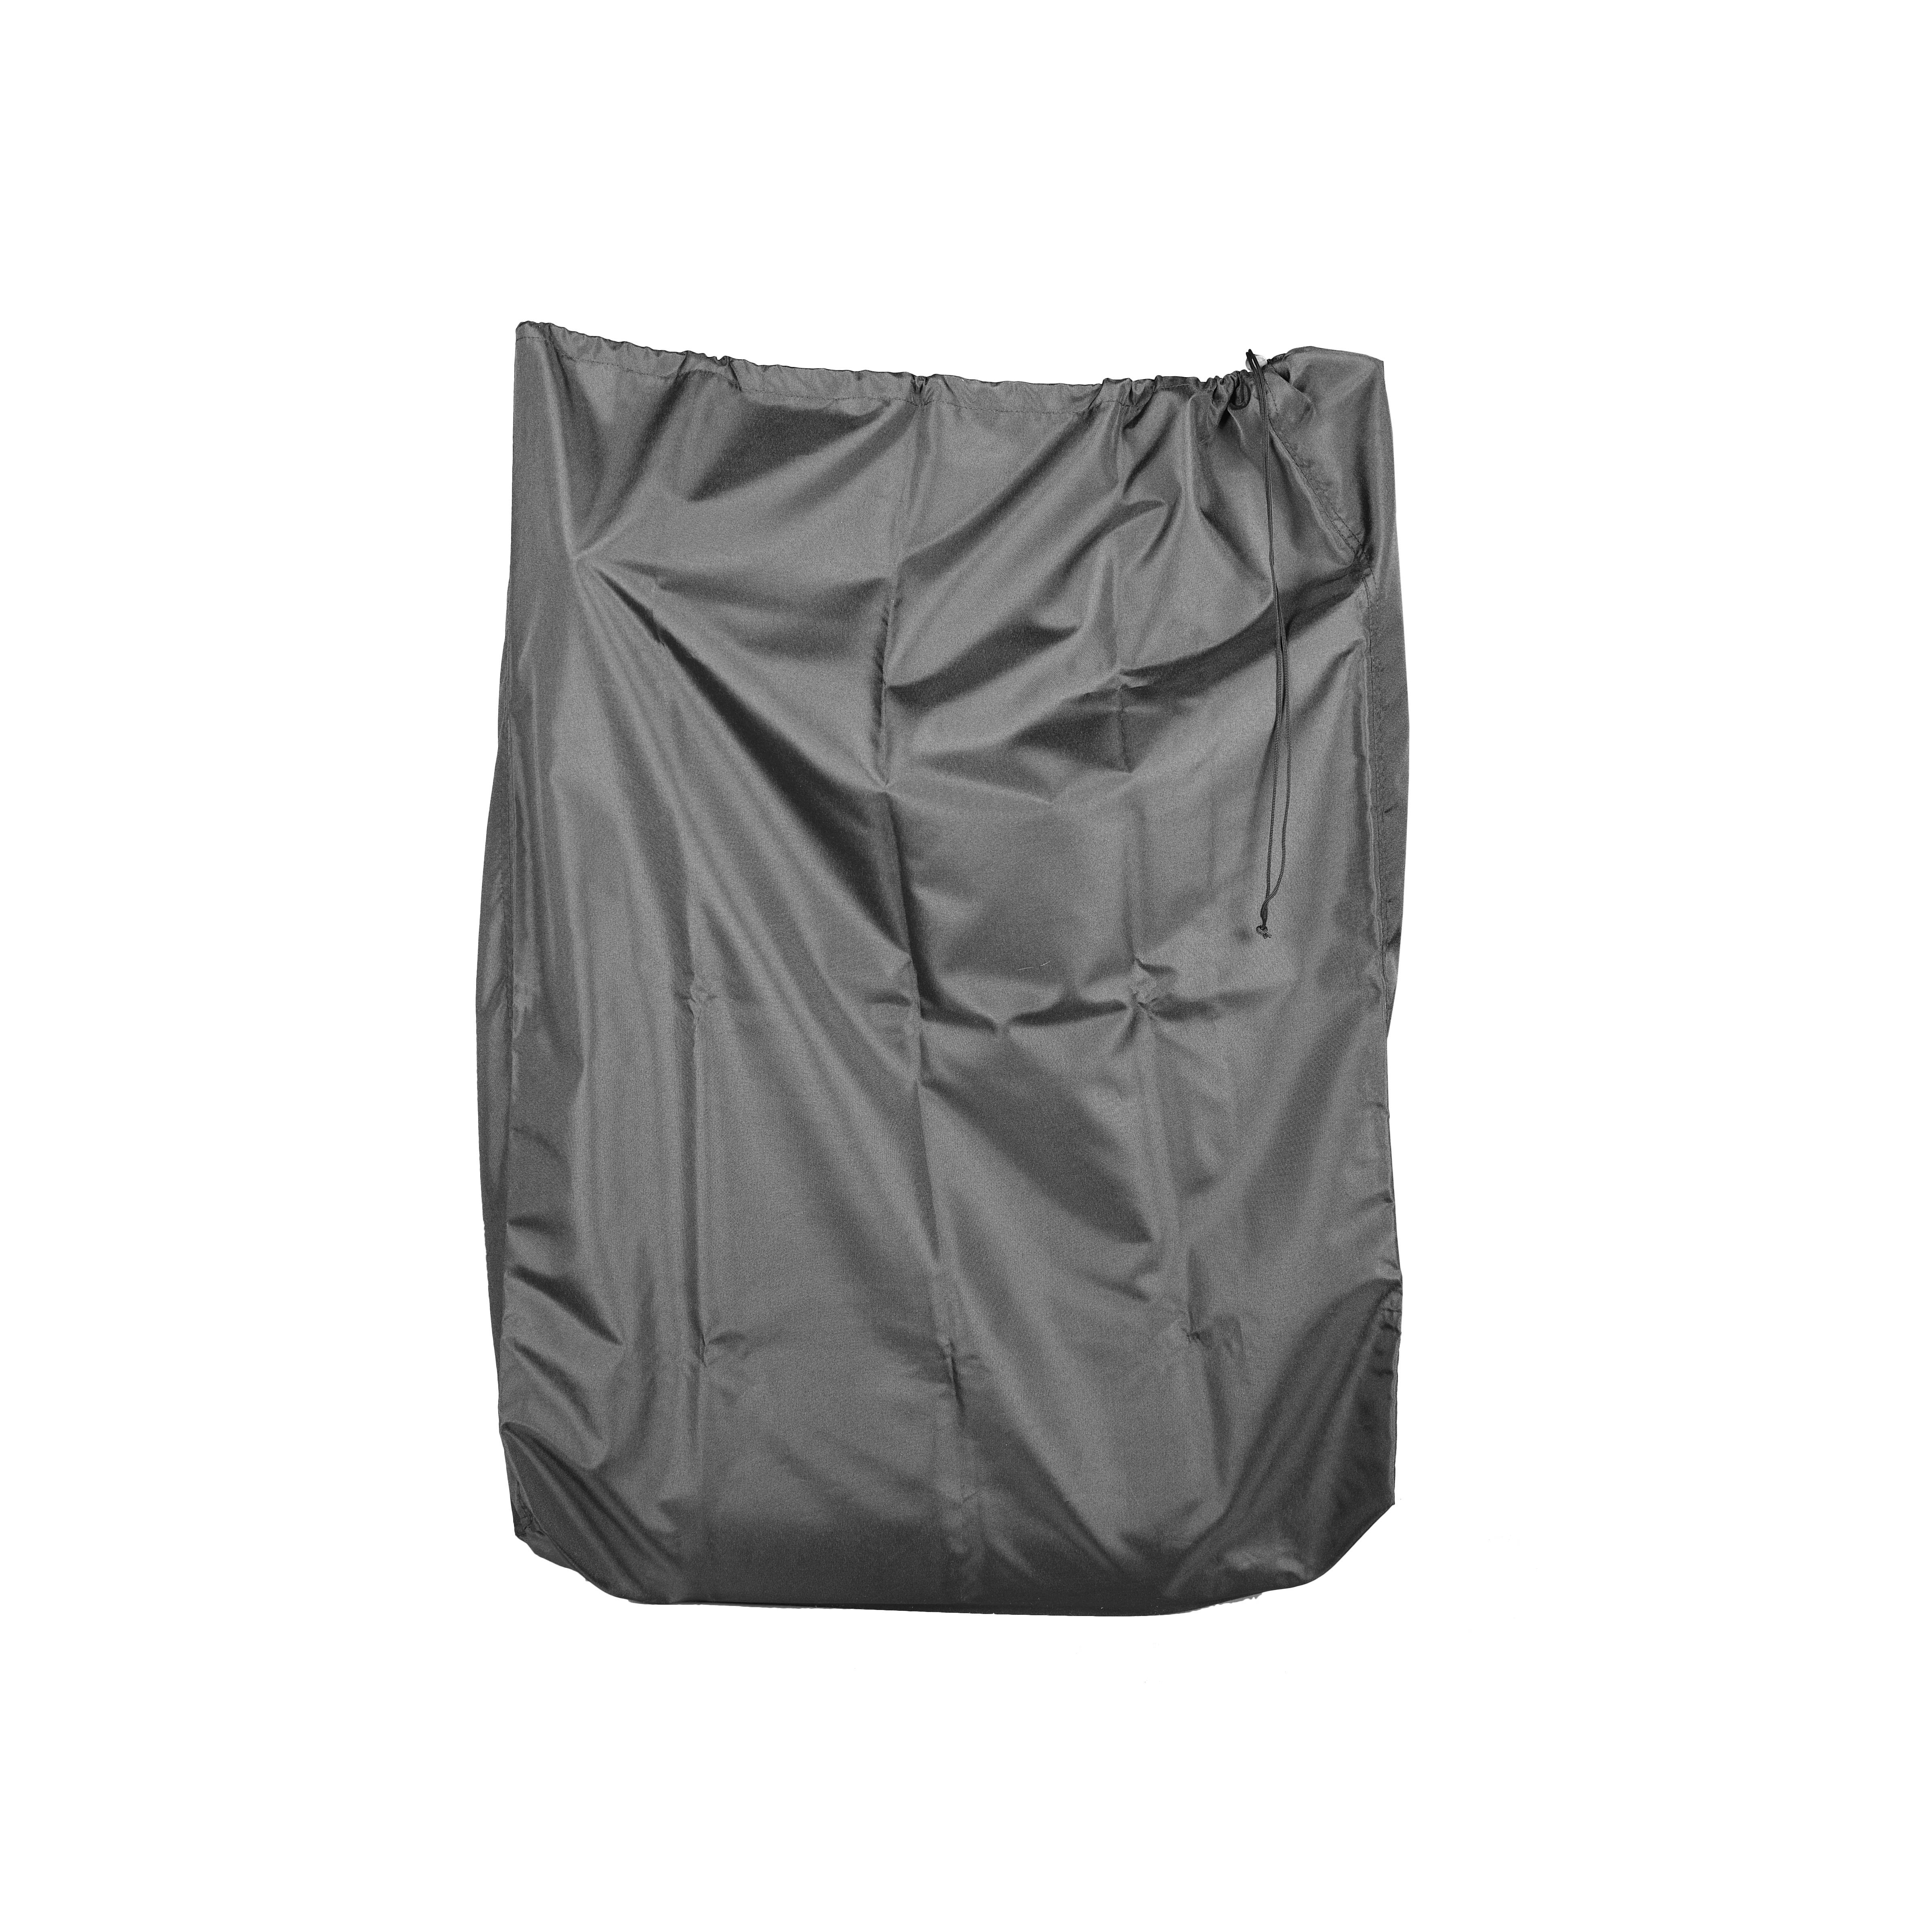 Bliss Hammocks GFC-COVXXL 2XL Gravity Free Recliner Furniture Cover  Black